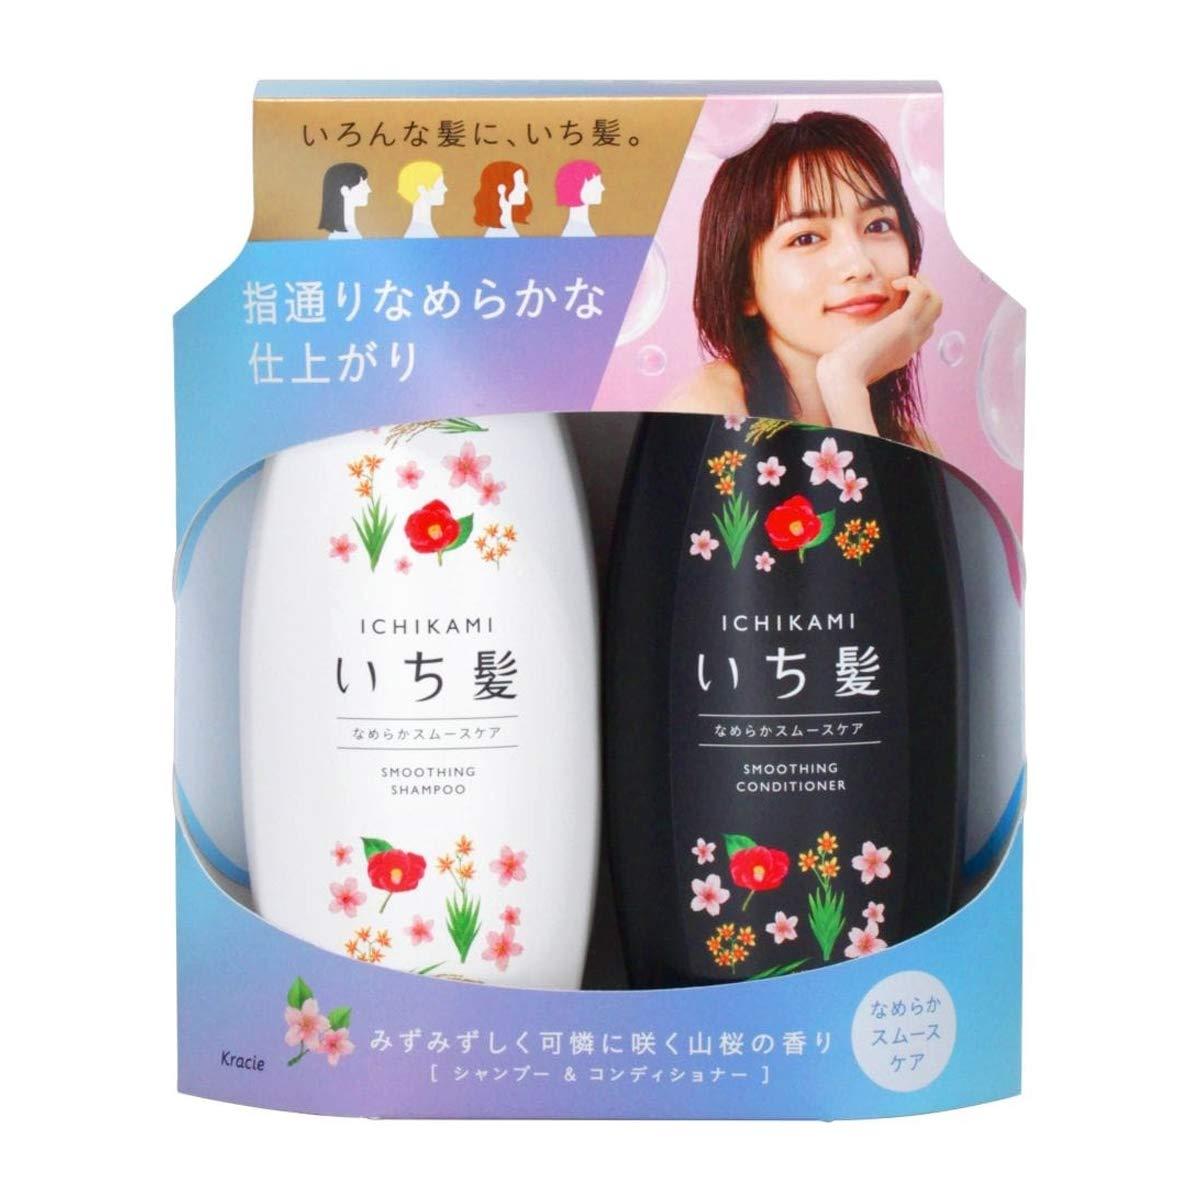 Ichikami Oil Control Gentle Shampoo & hair care Set with Hair Mask 480ml + 480g + 10g